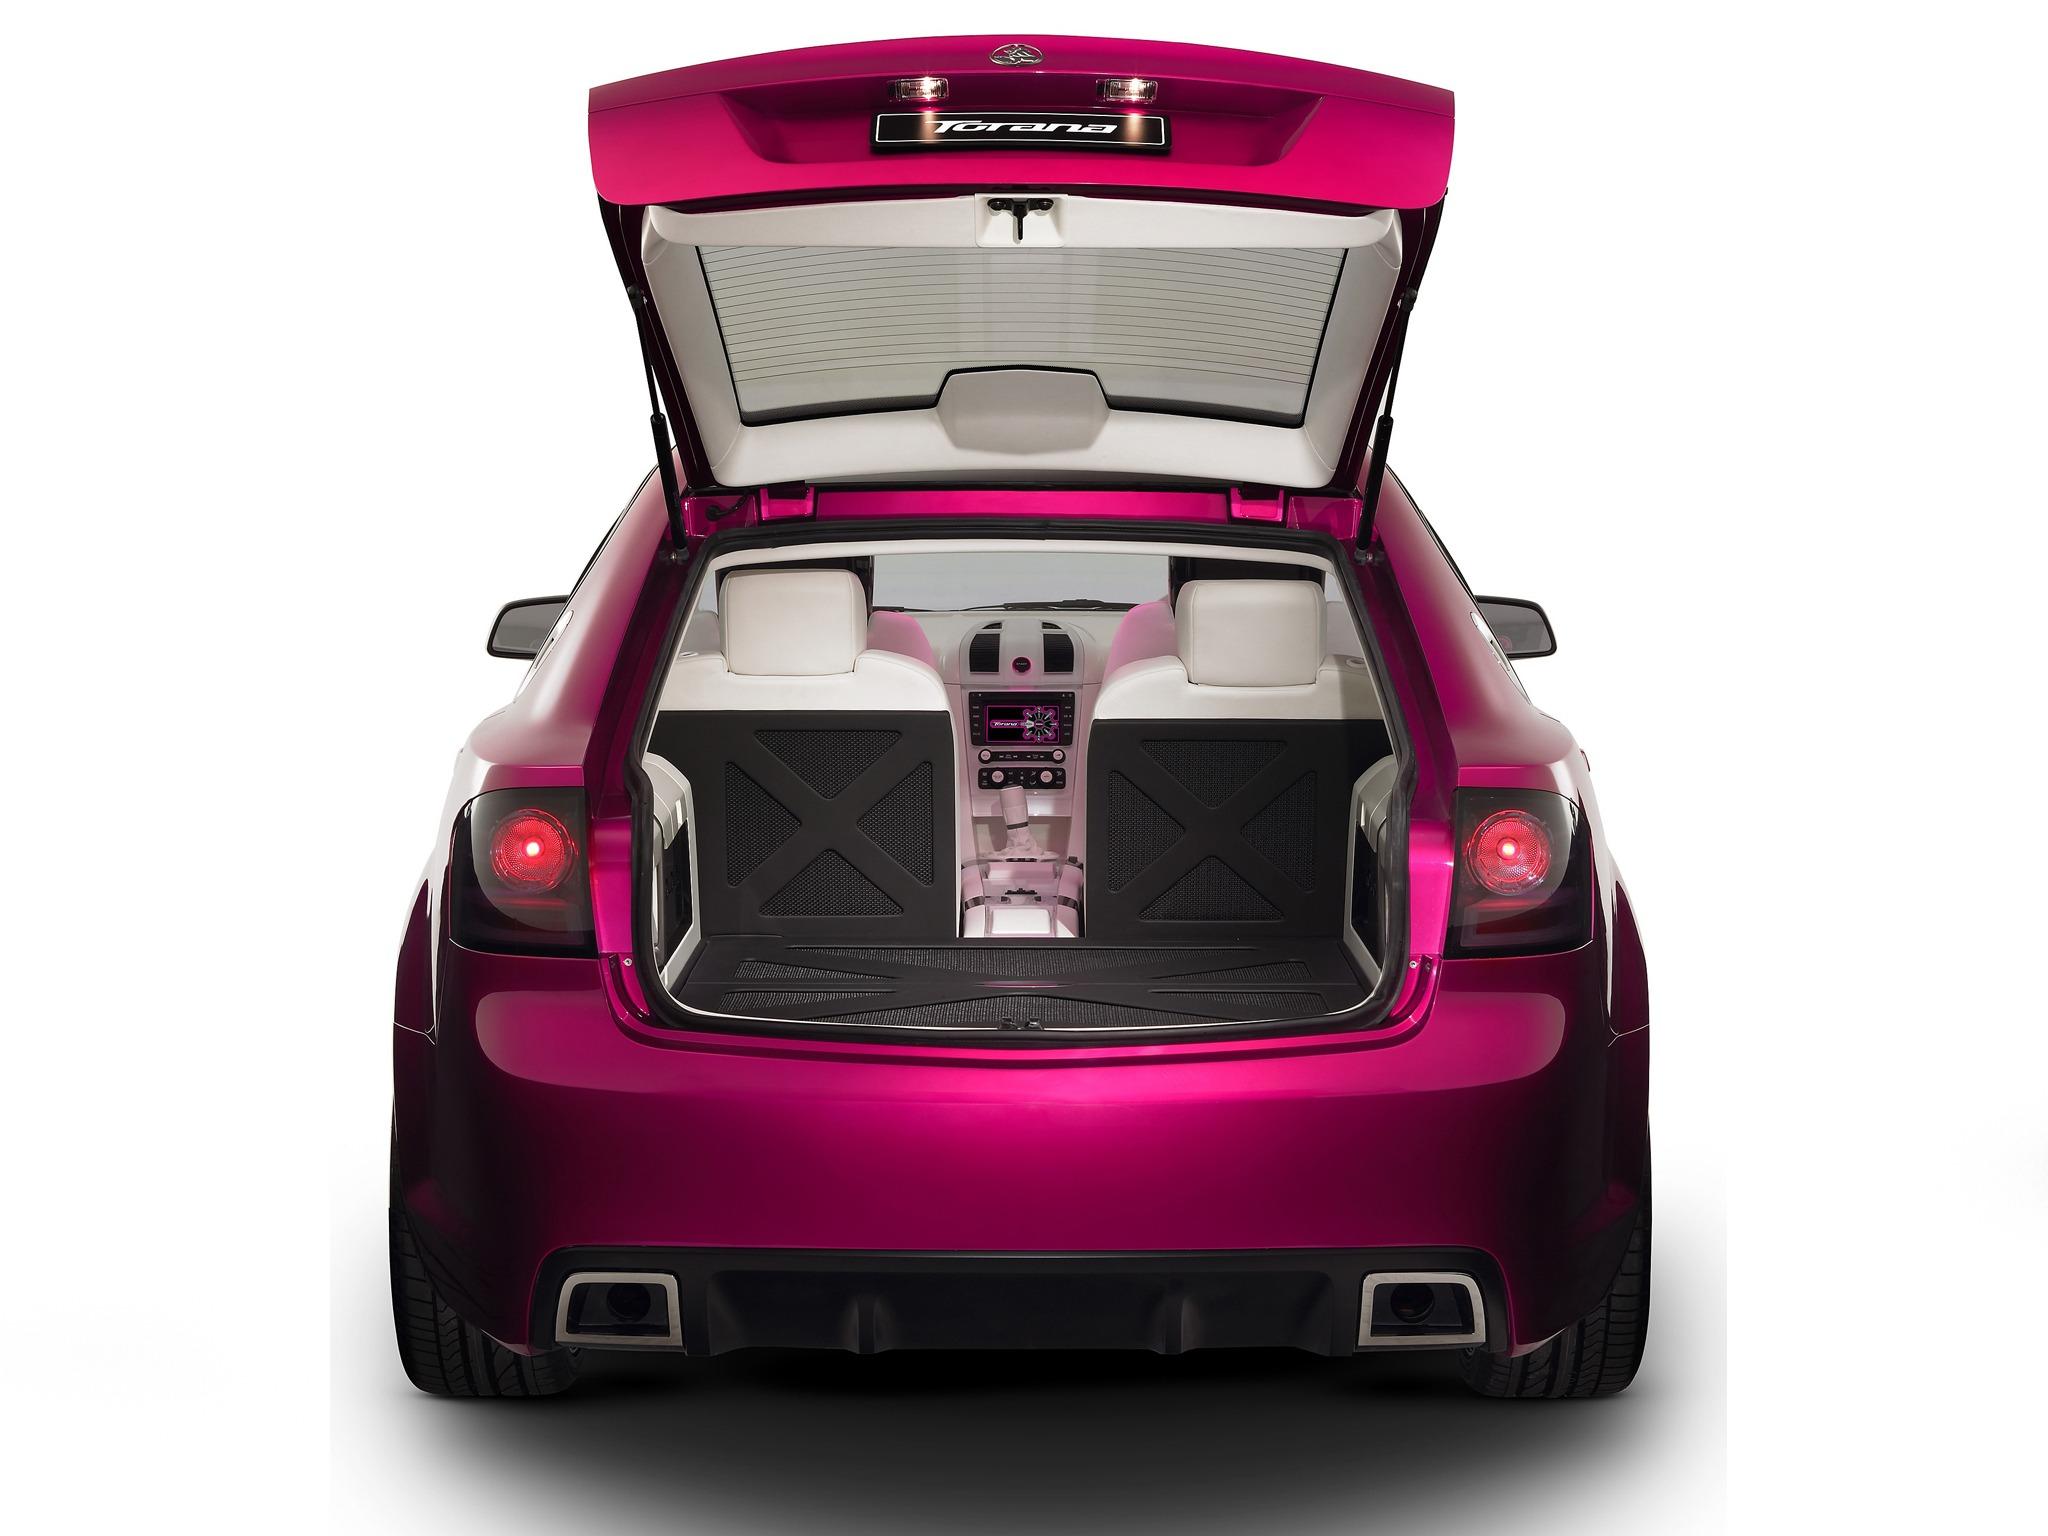 Saab Dealer Near Me >> Holden Torana TT36 Hatch Concept (2004) - Old Concept Cars